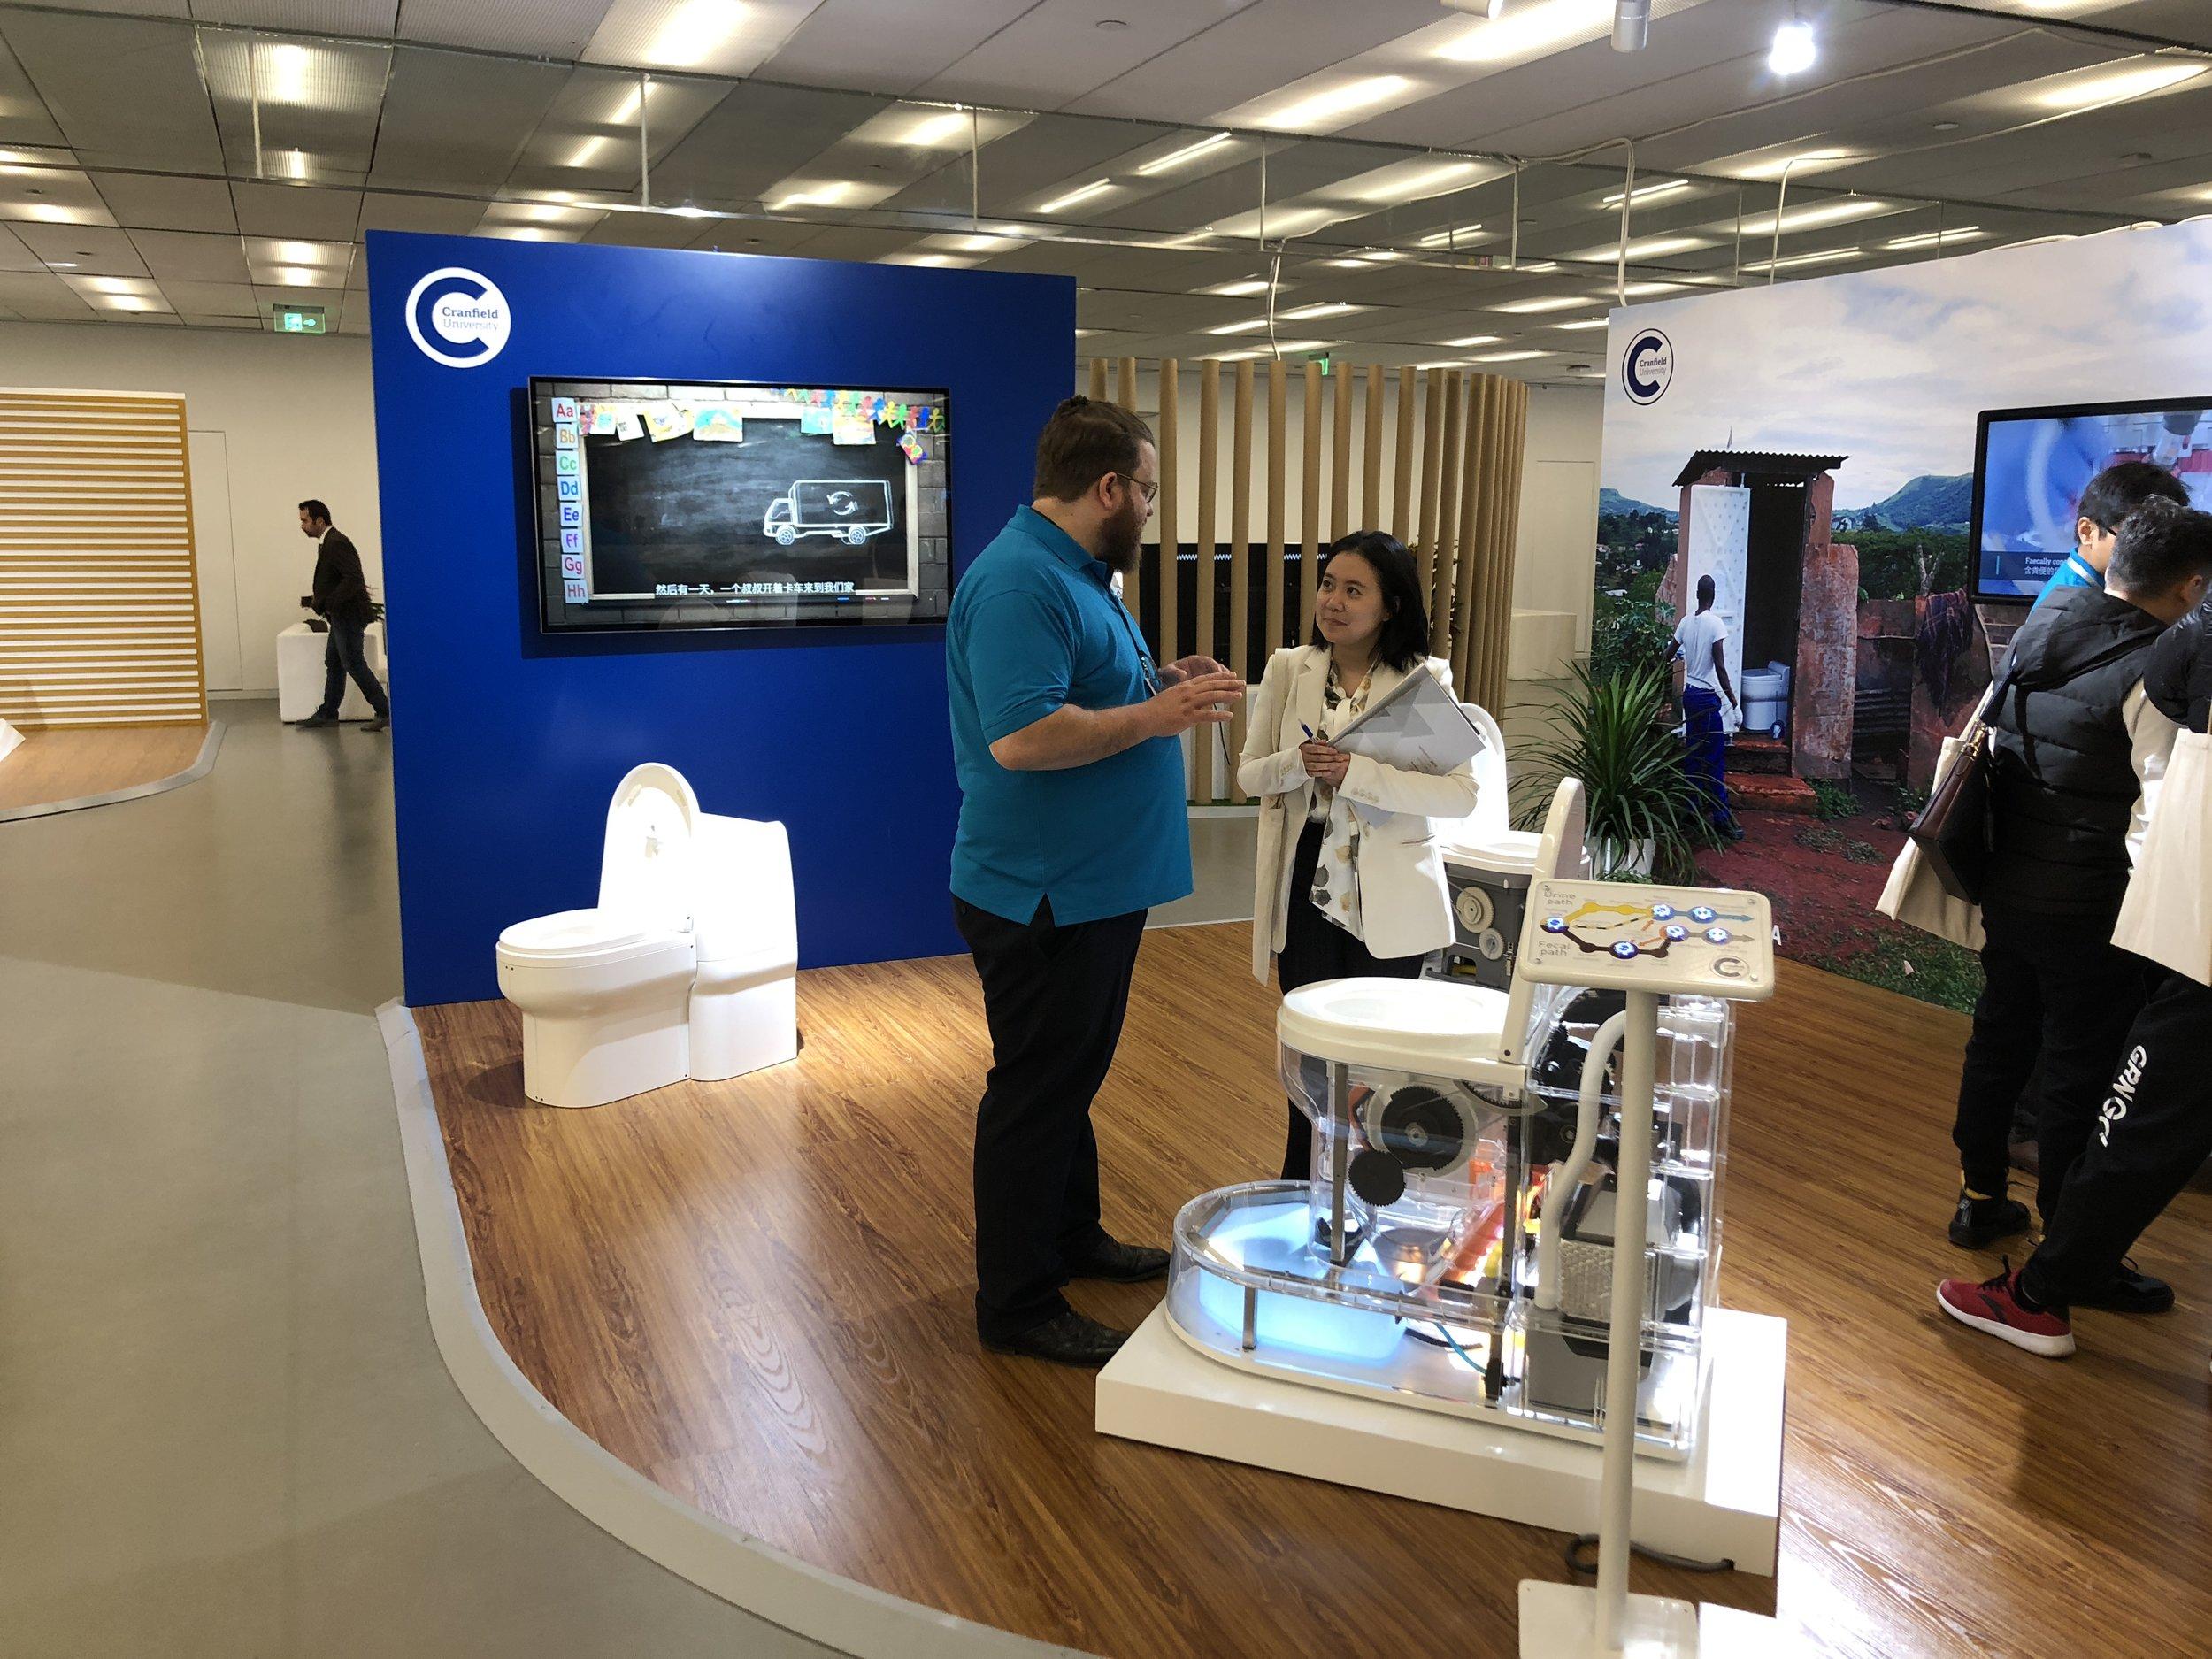 Cranfield Nanomembrane Toilet,  Bill and Melinda Gates Foundation,  Beijing